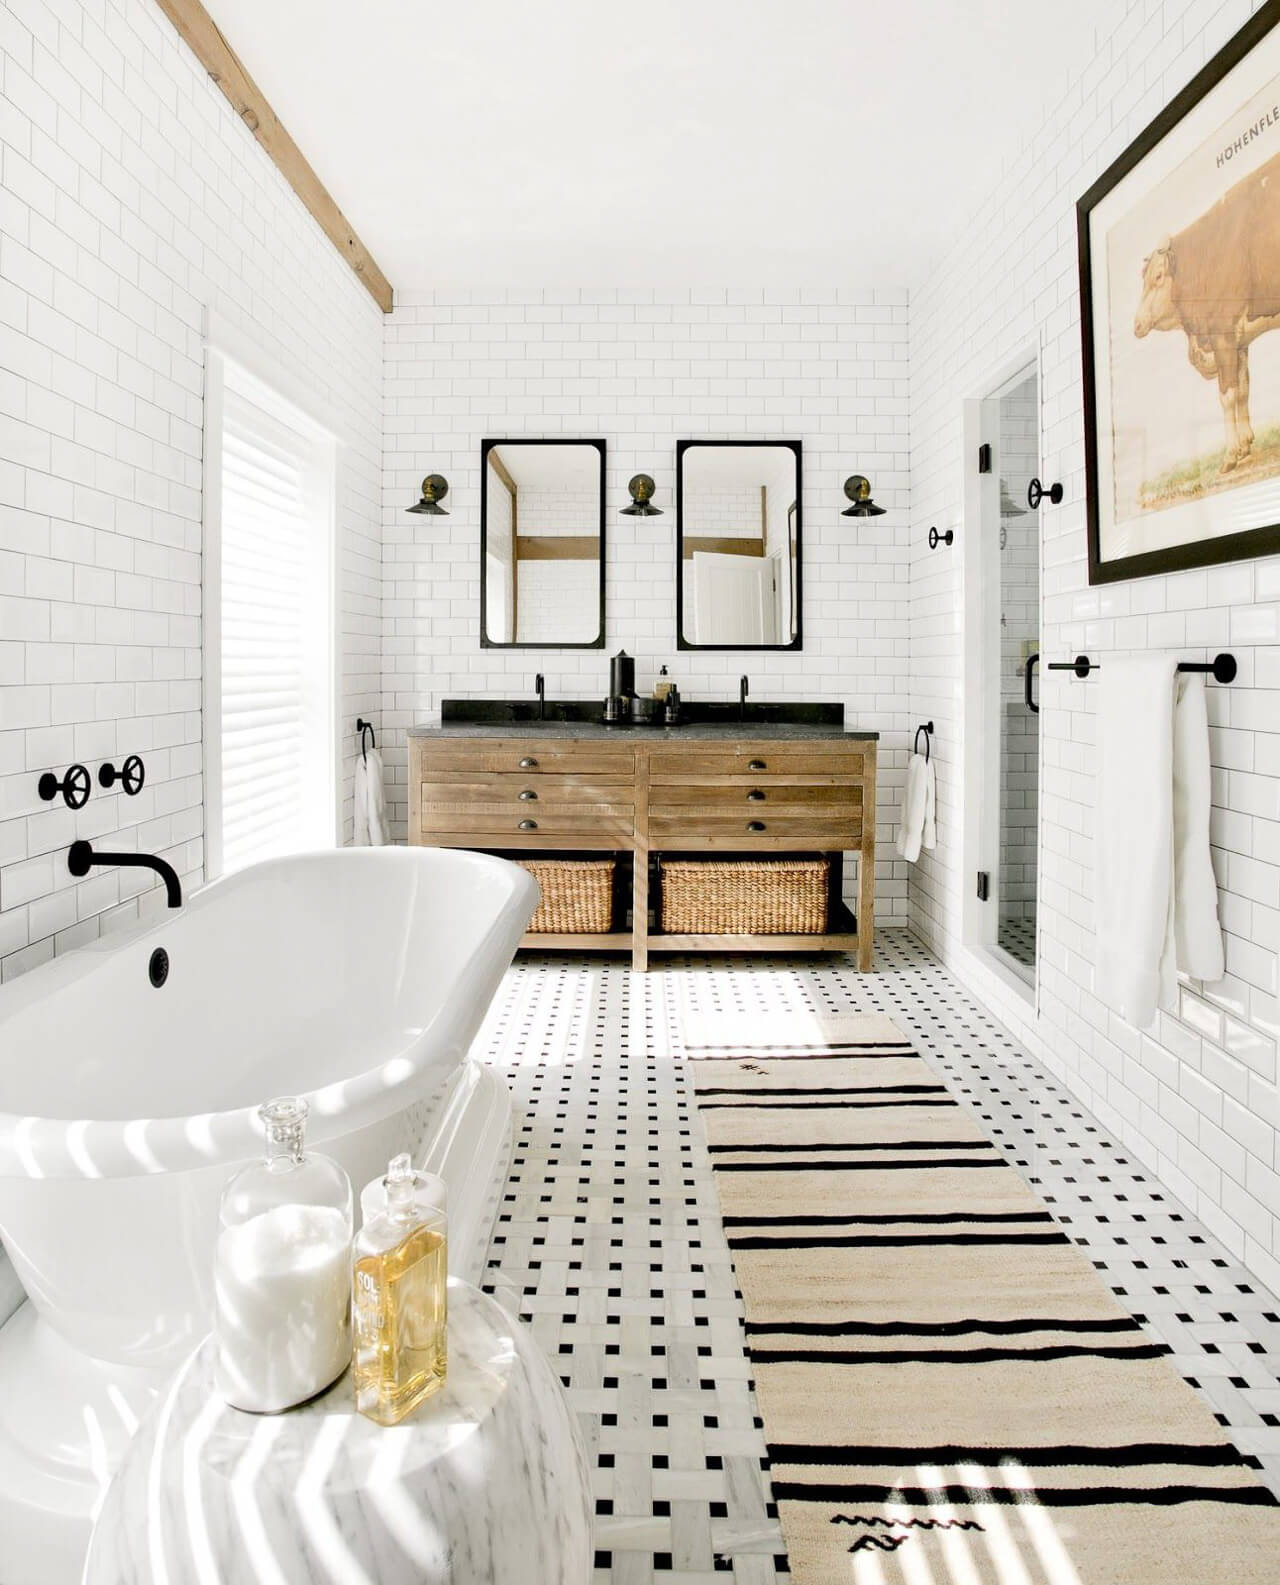 Love this black and white bathroom inspiraiton! - M Loves M @marmar